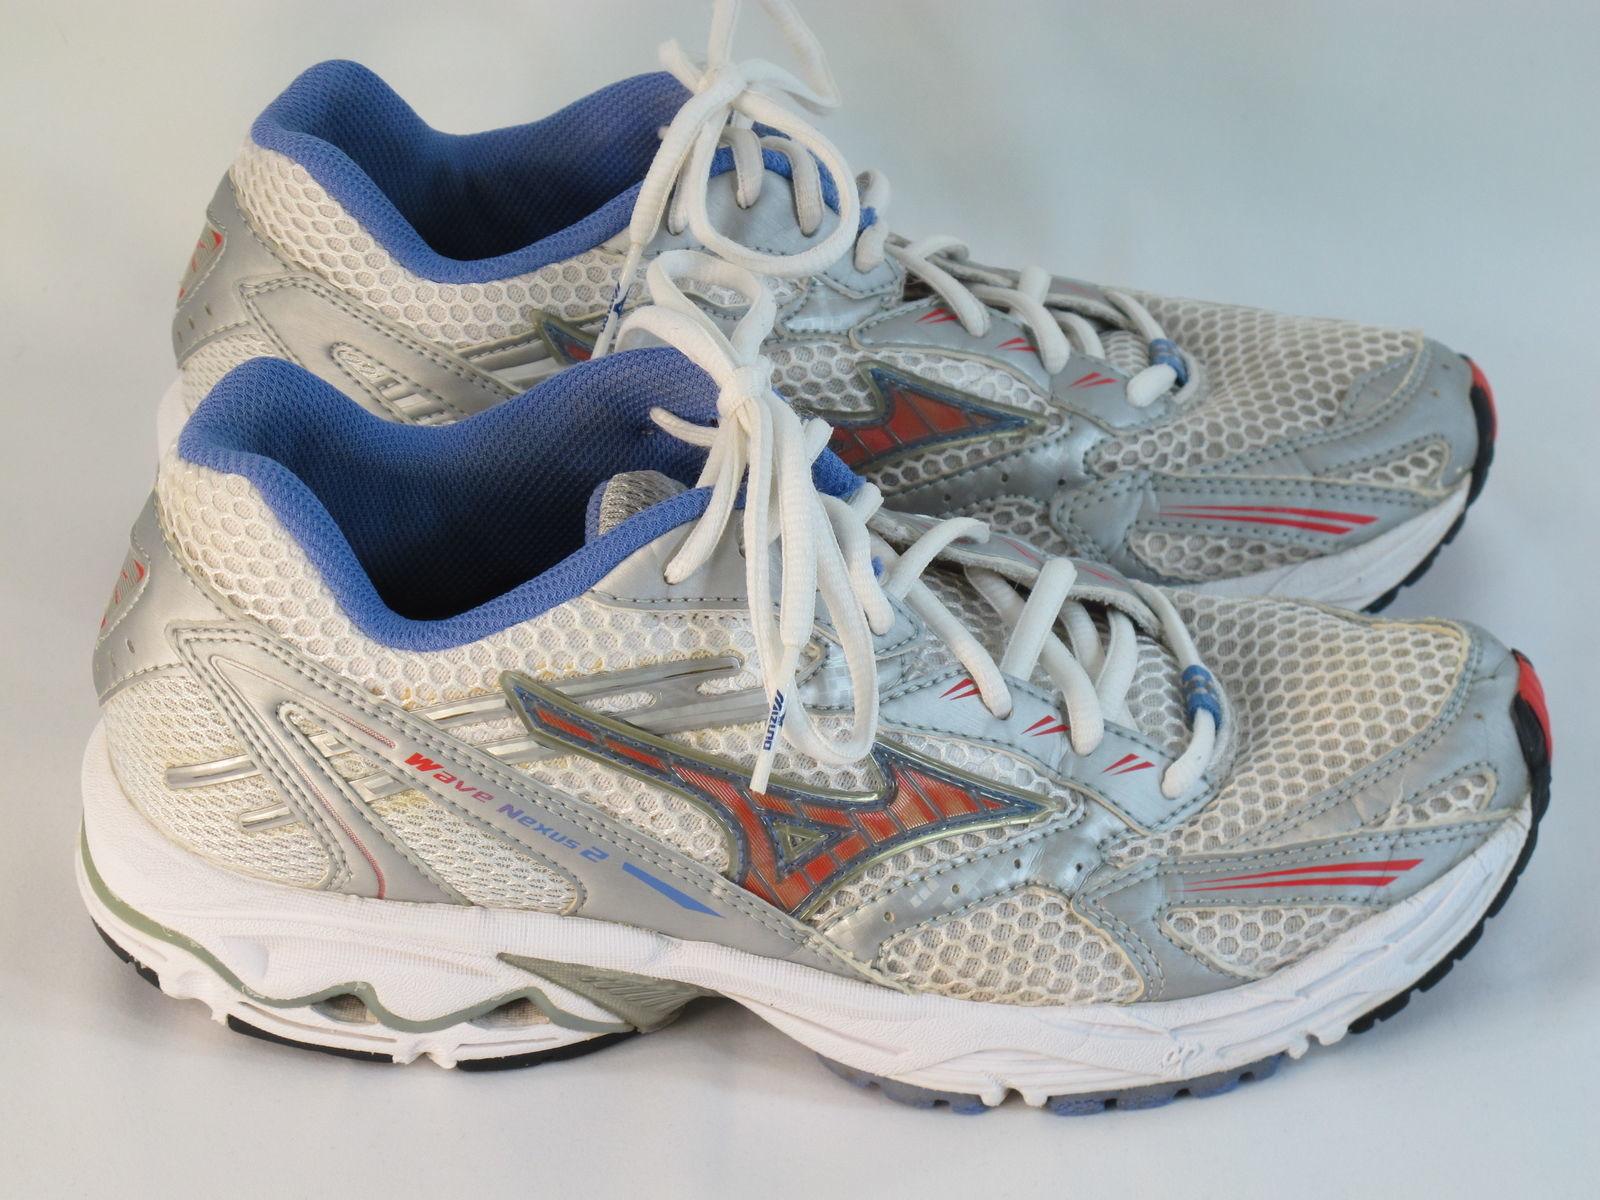 mizuno womens running shoes size 8.5 in usa ladies golf